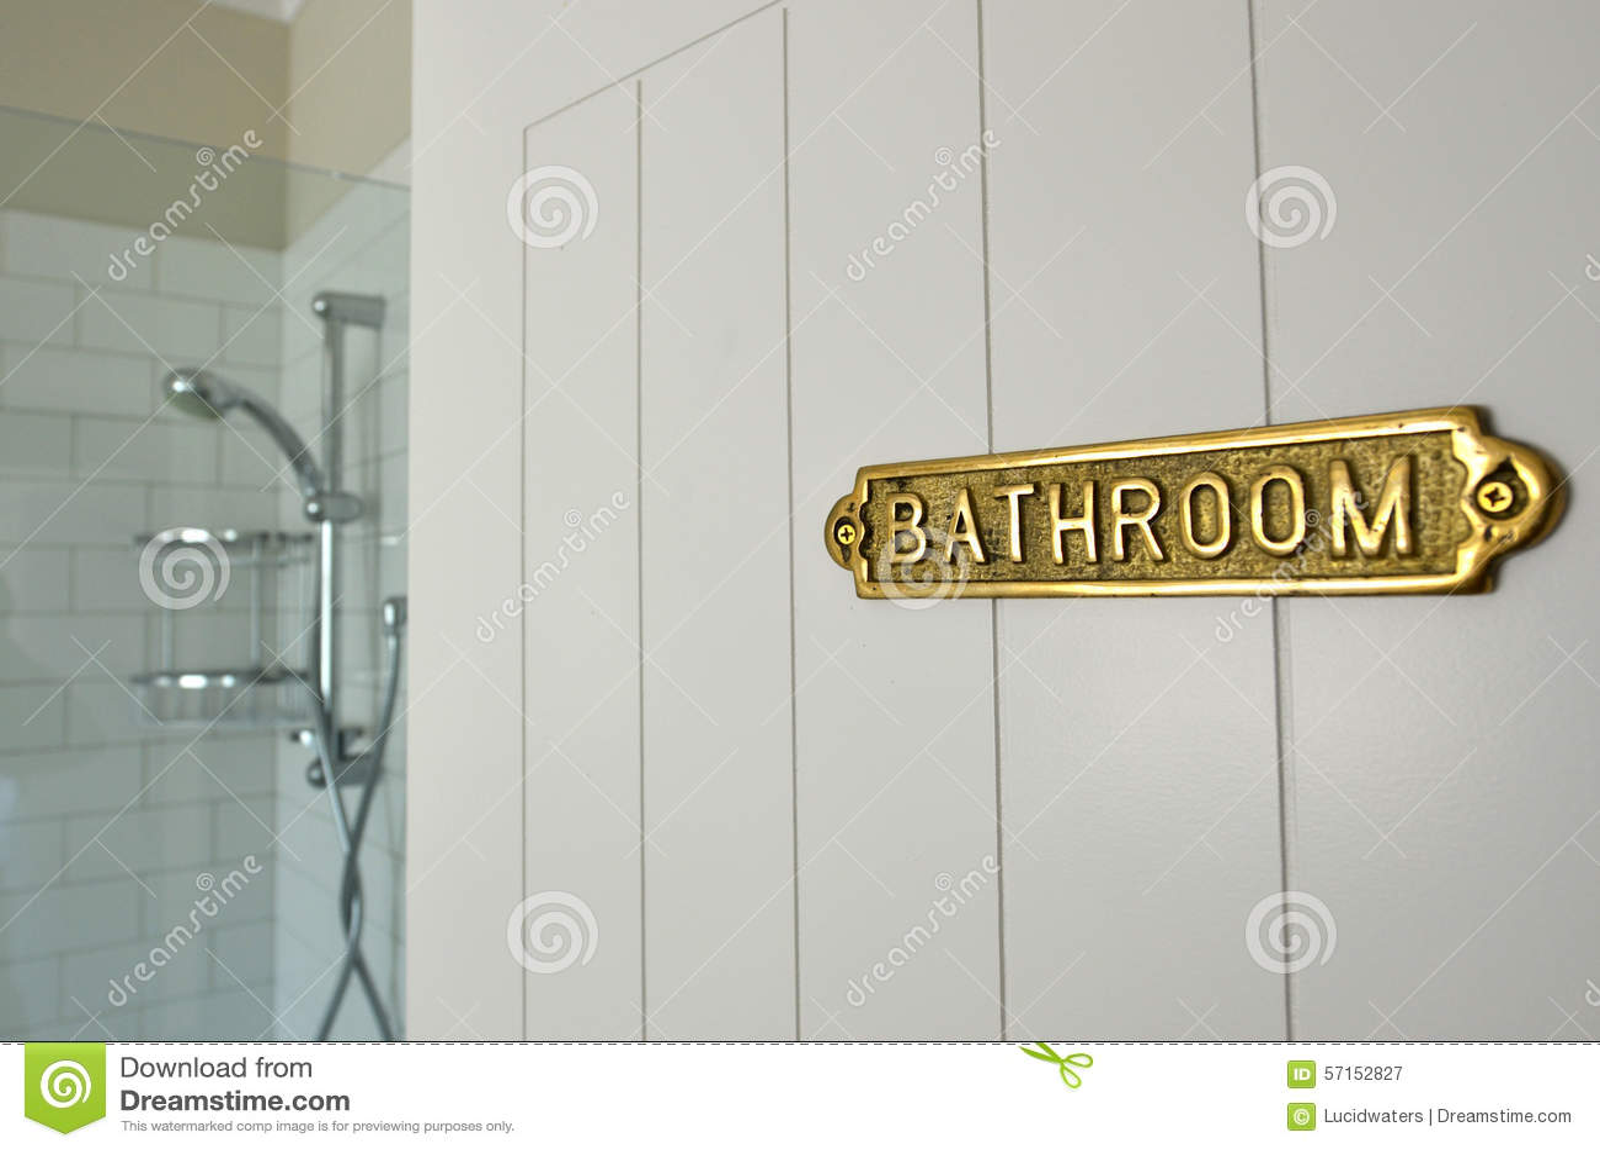 Sign for bathroom door - Bathroom Sign On A Home Bathroom Door